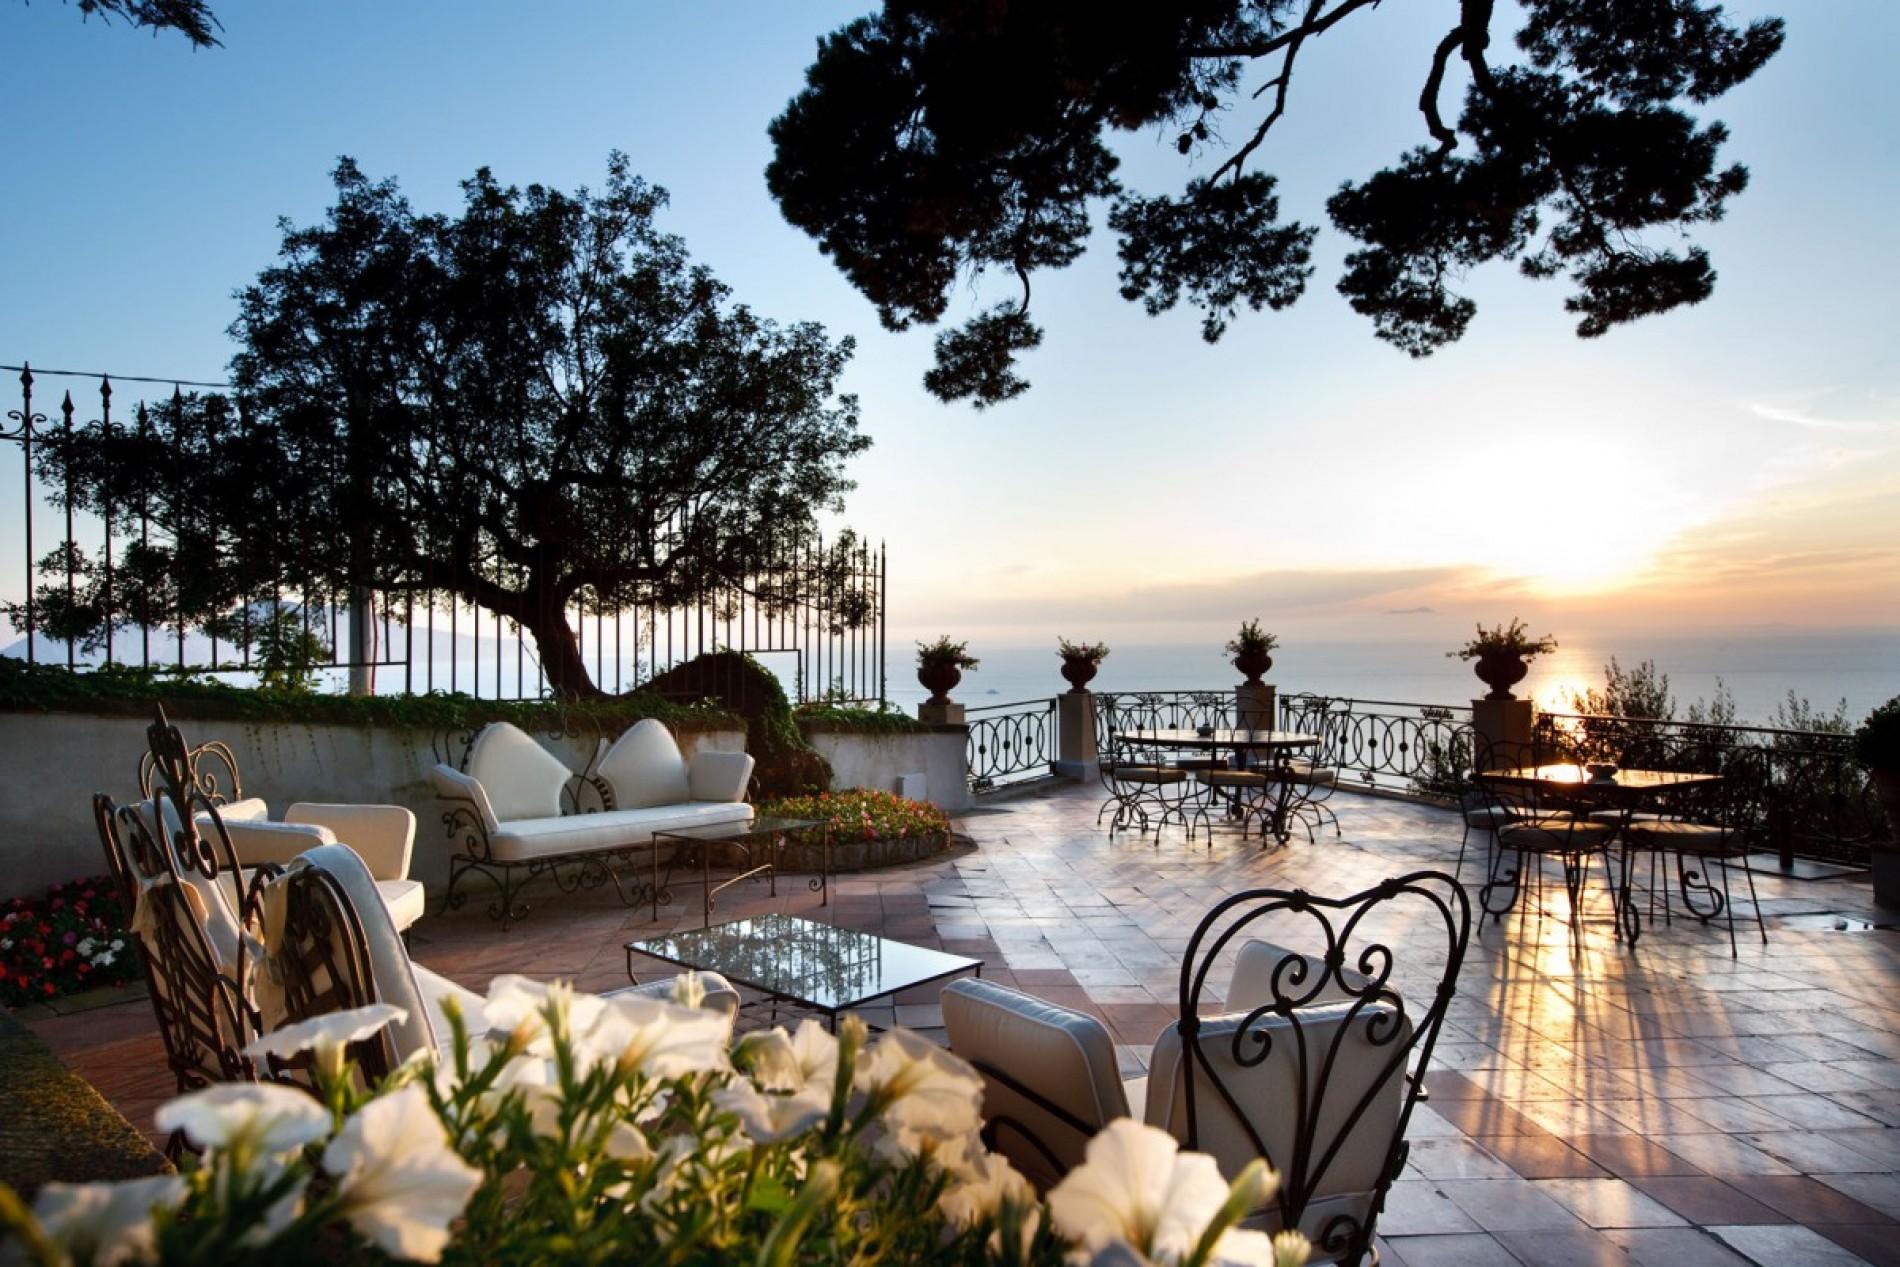 Best Kitchen Gallery: Terrace Amalfi Coast 5 Bedrooms of Villas In Amalfi Coast  on rachelxblog.com